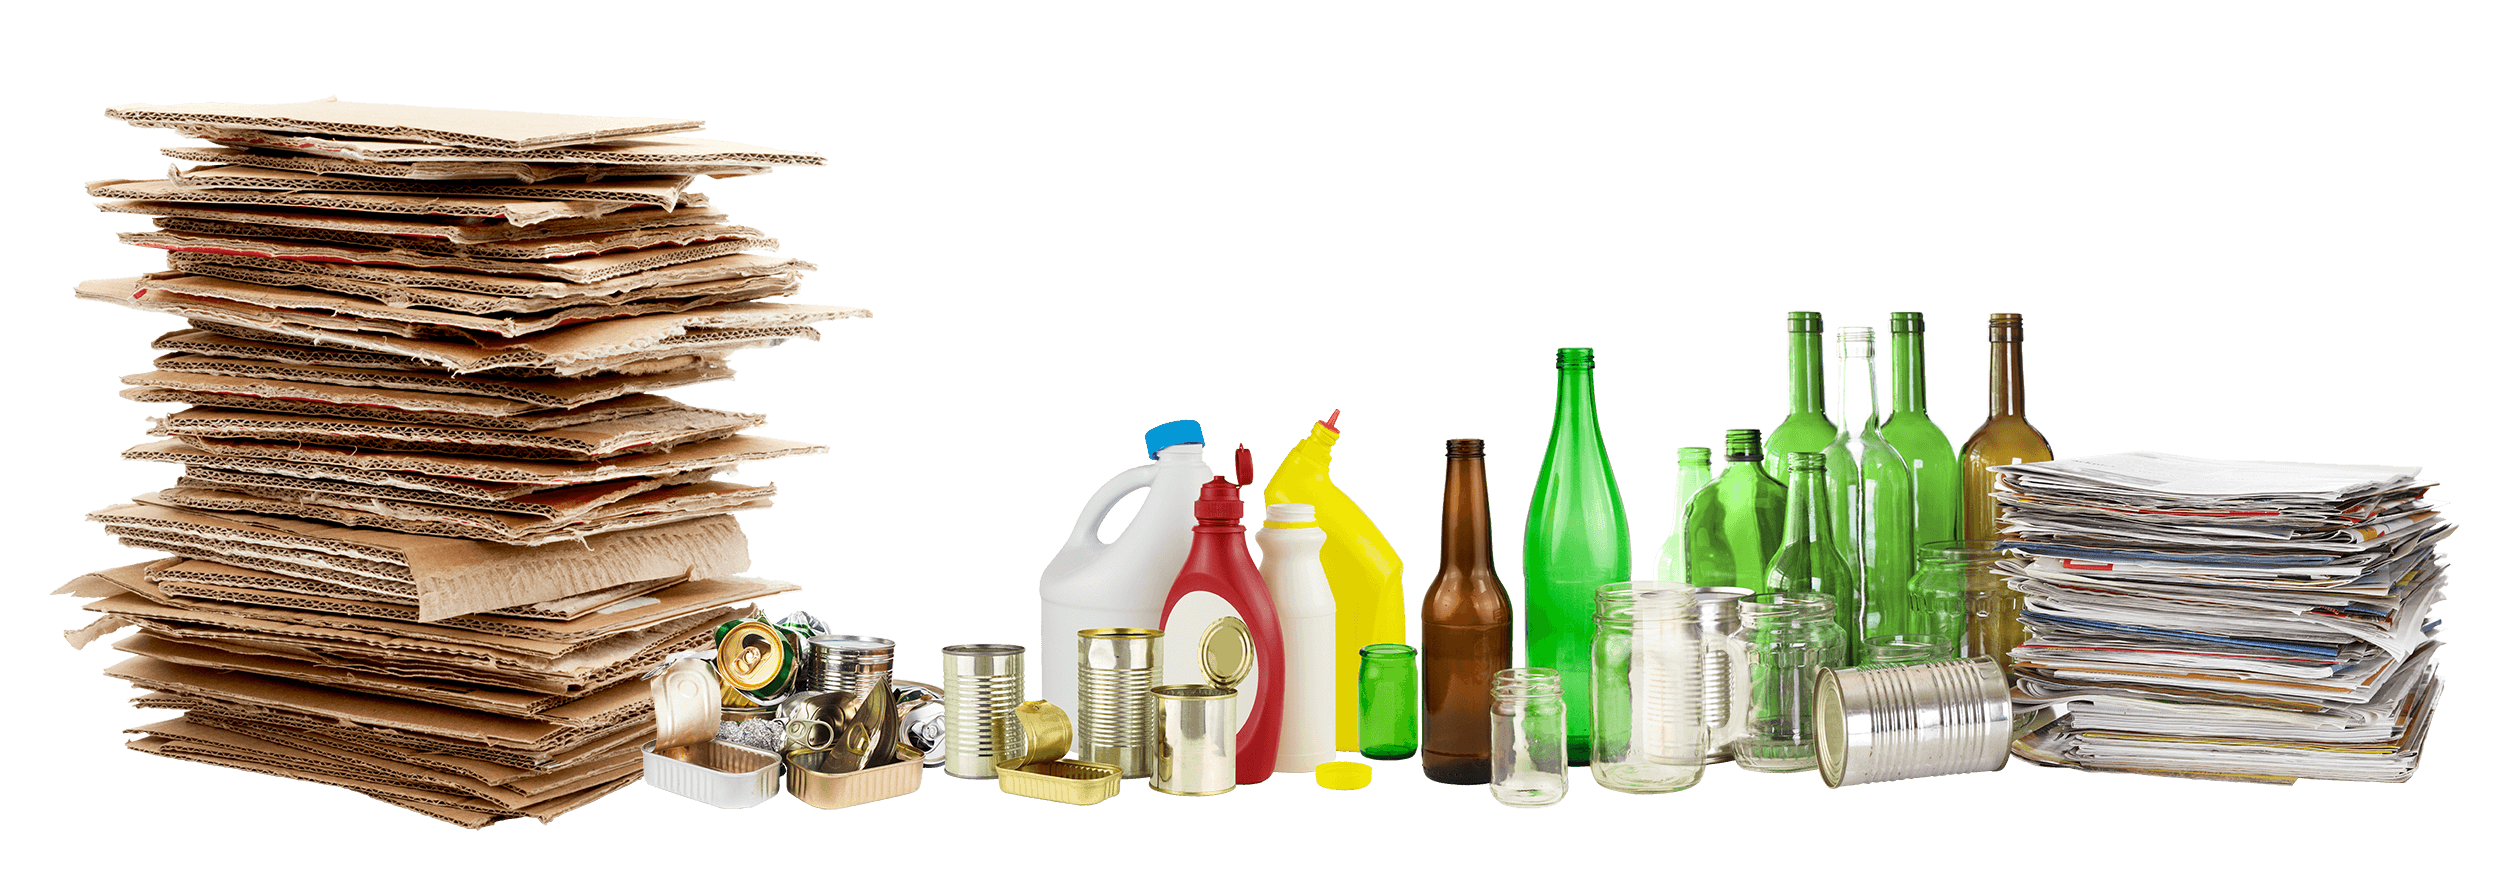 Cardboard, Metal, Plastic, Glass Recycling